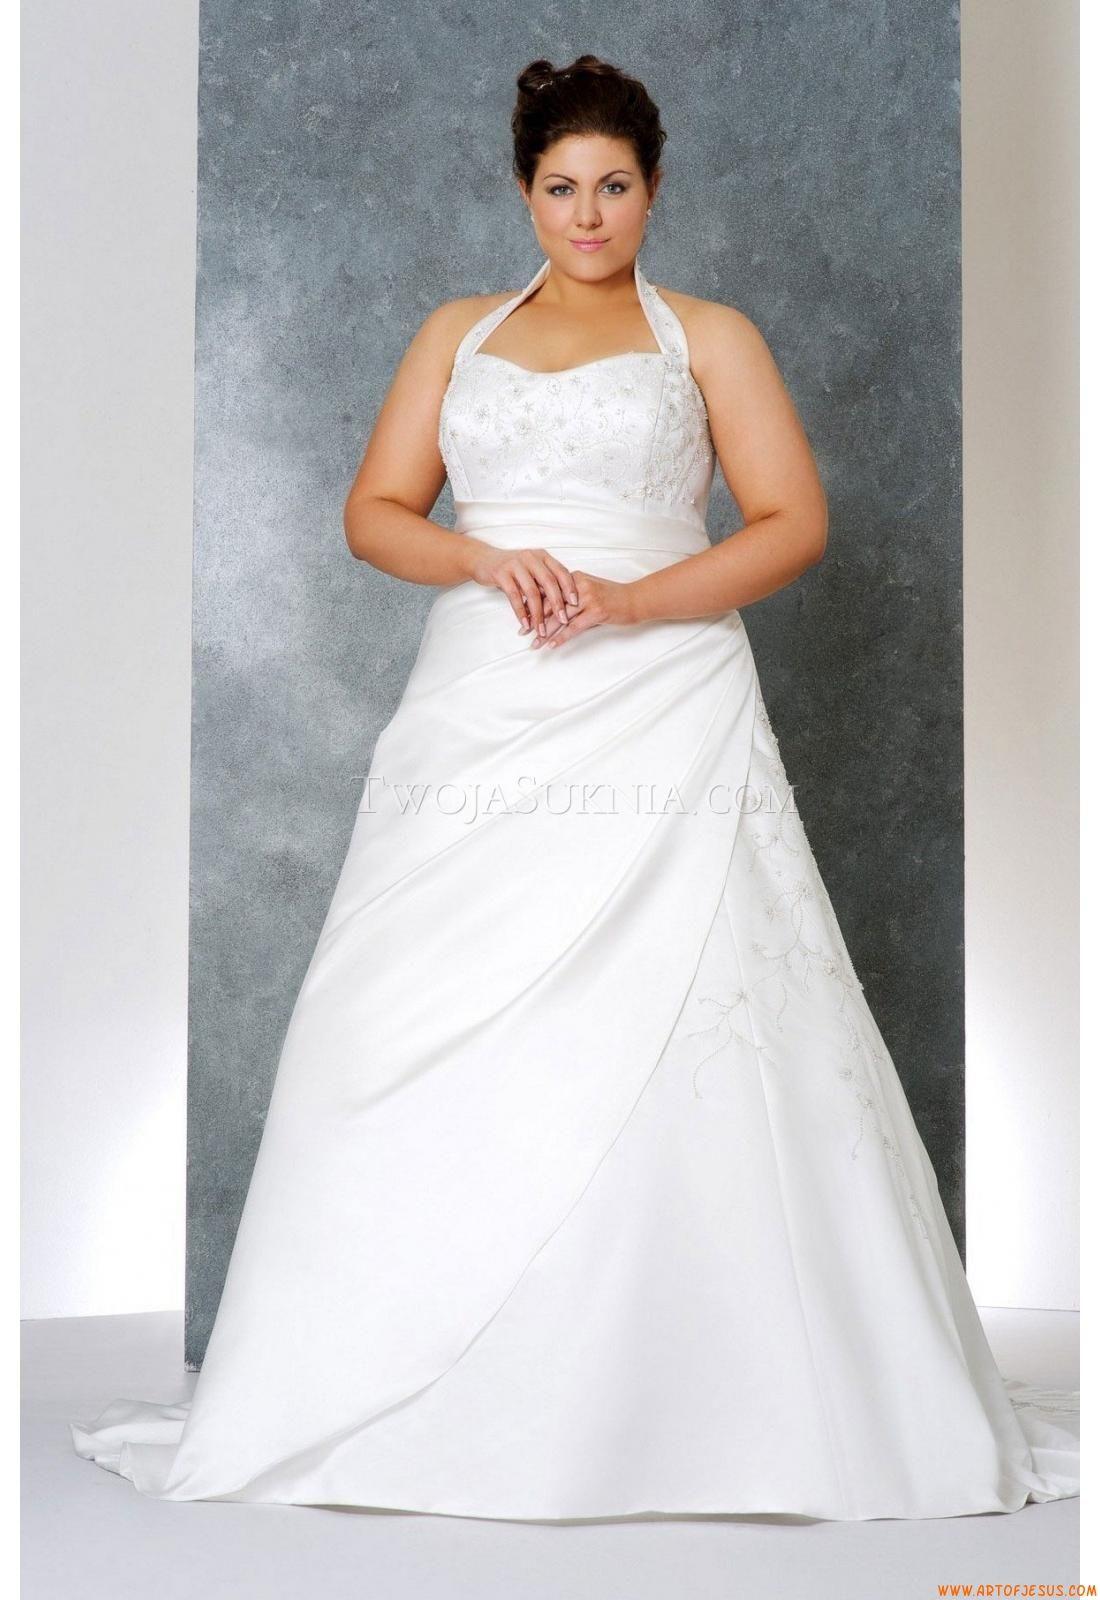 Wedding Dress Veromia 9013 Sonsie   wedding dresses Hordaland ...